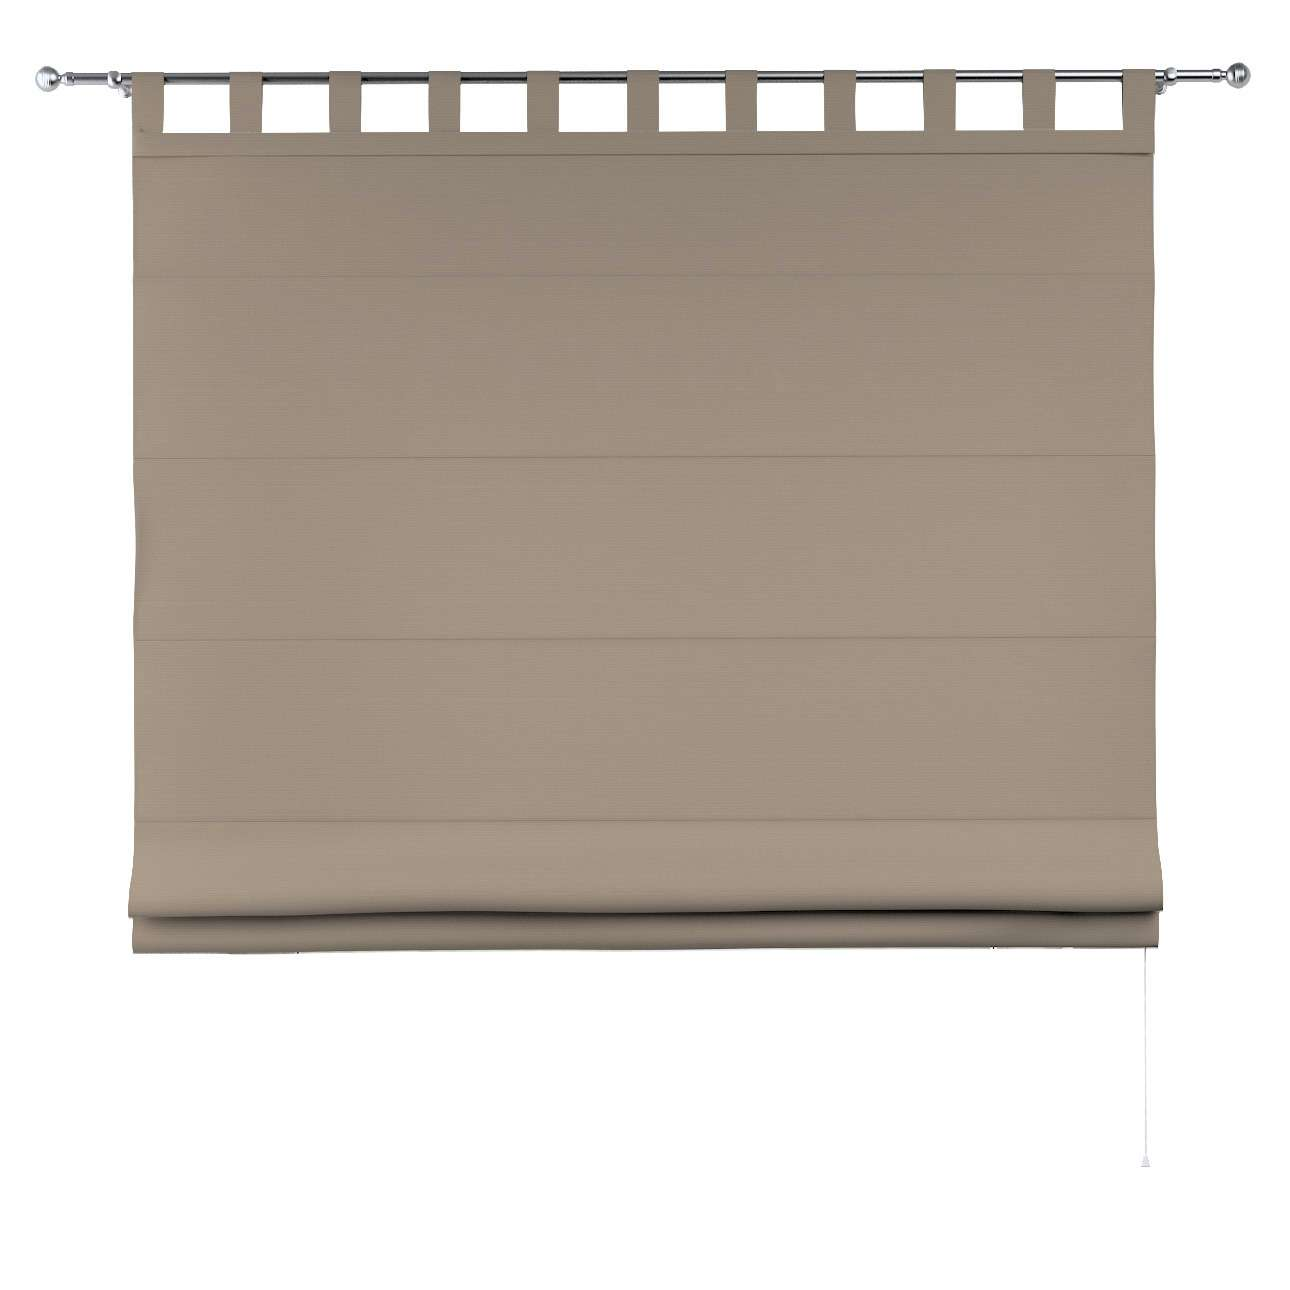 Verona raffrolók 80 x 170 cm a kollekcióból Bútorszövet Cotton Panama, Dekoranyag: 702-28